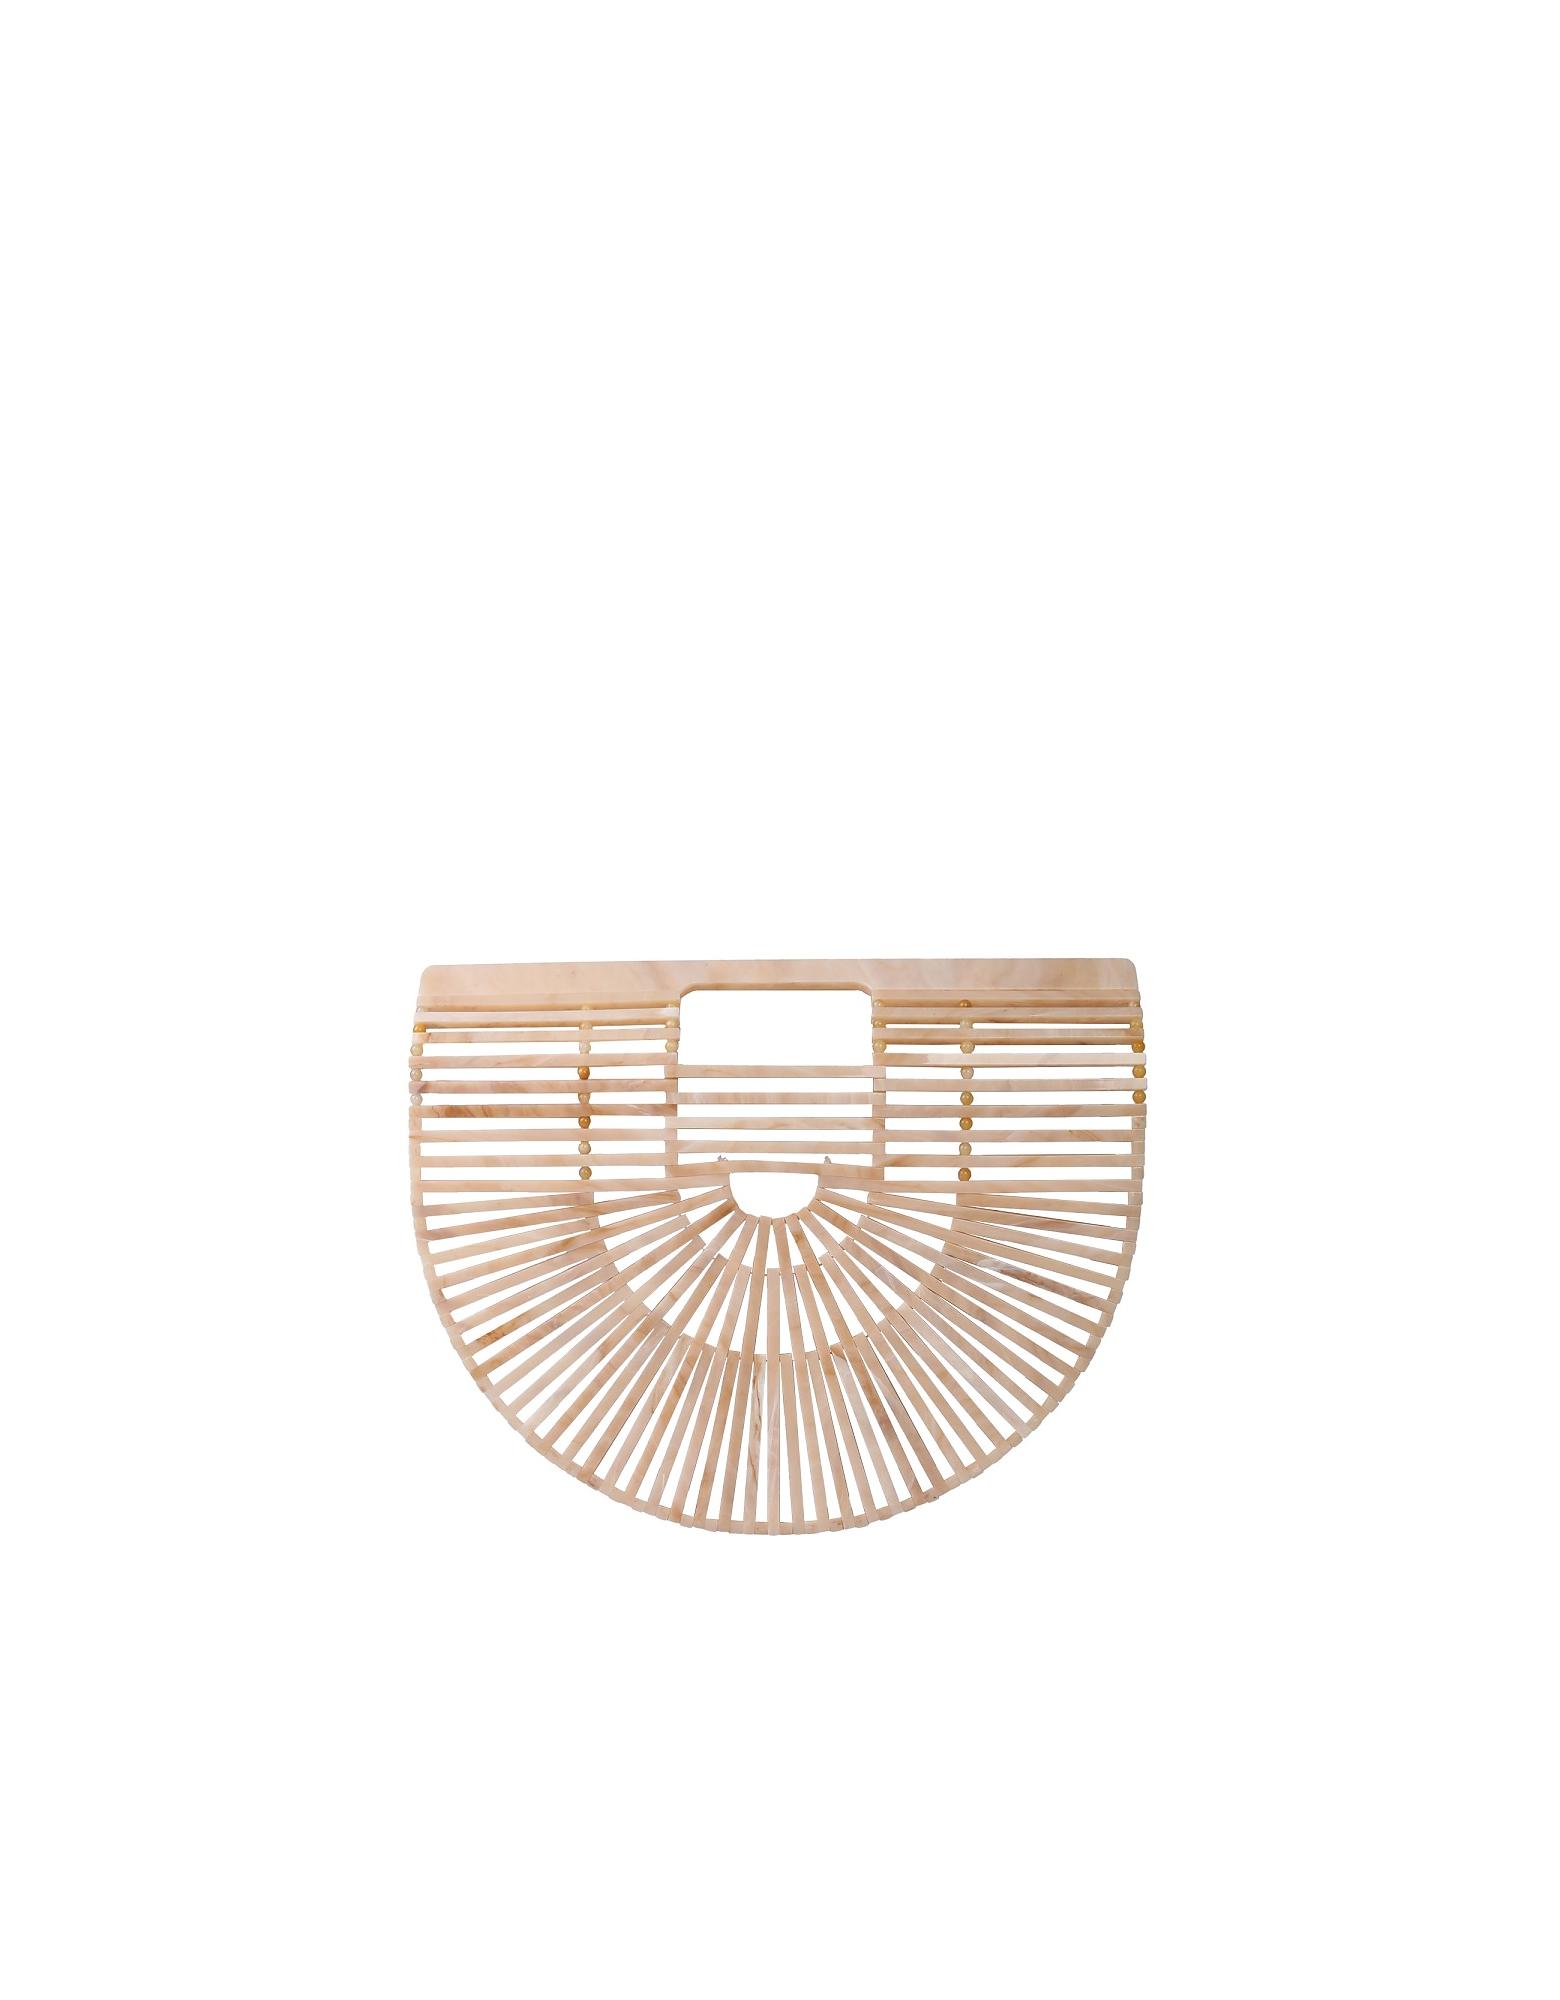 Cult Gaia Designer Handbags, Small Gaia's Ark Bag